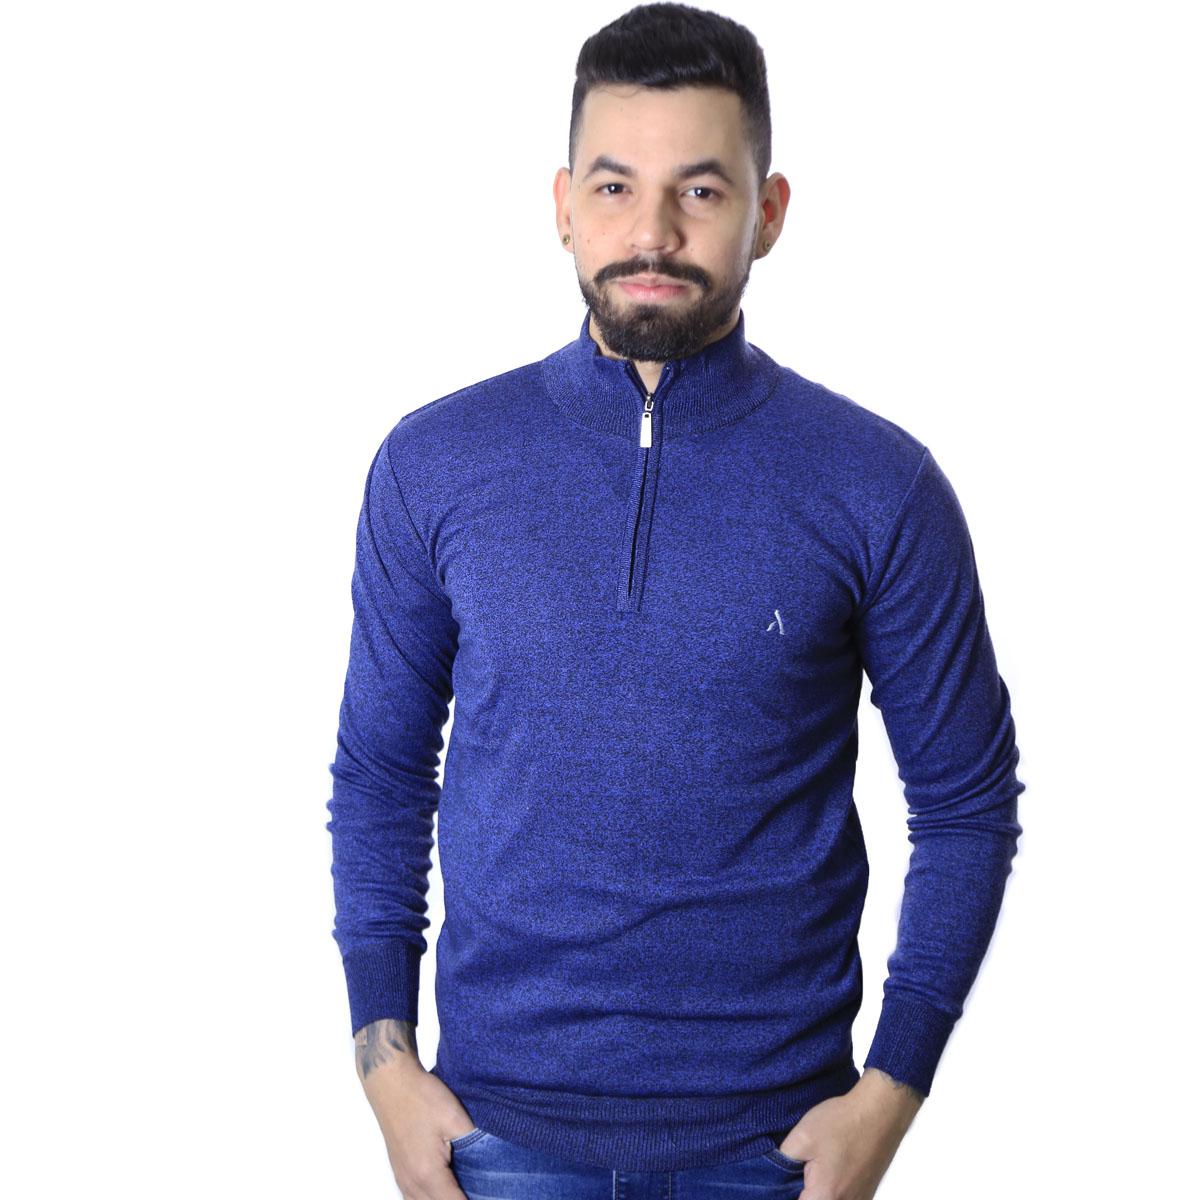 Suéter Agricio Meio Ziper Basico Azul Mescla